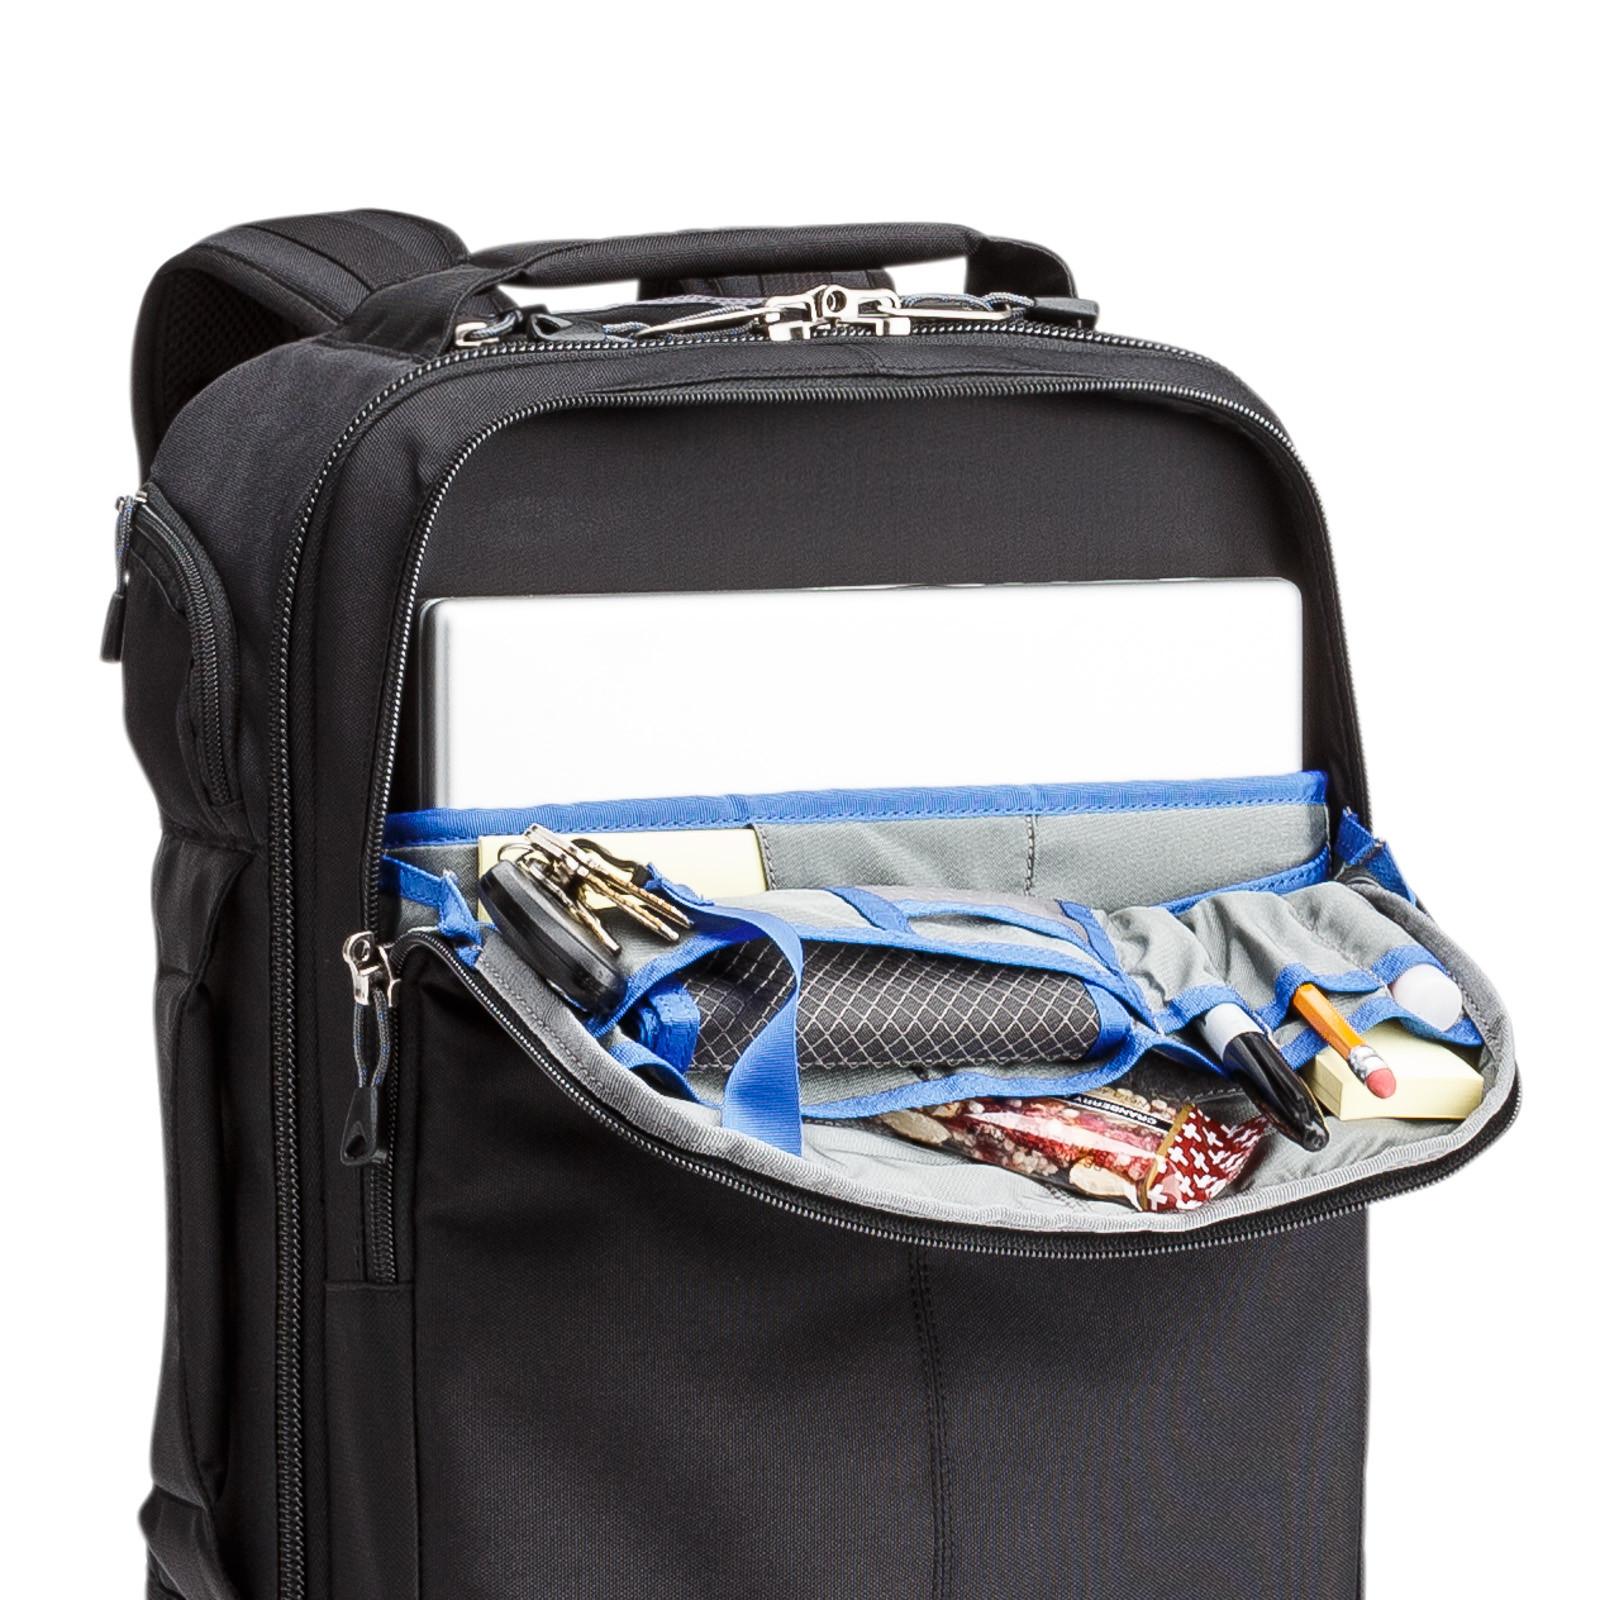 Think Tank Photo Airport Essentials Backpack Black St Cloud Sirui Slinglite 12 Grey